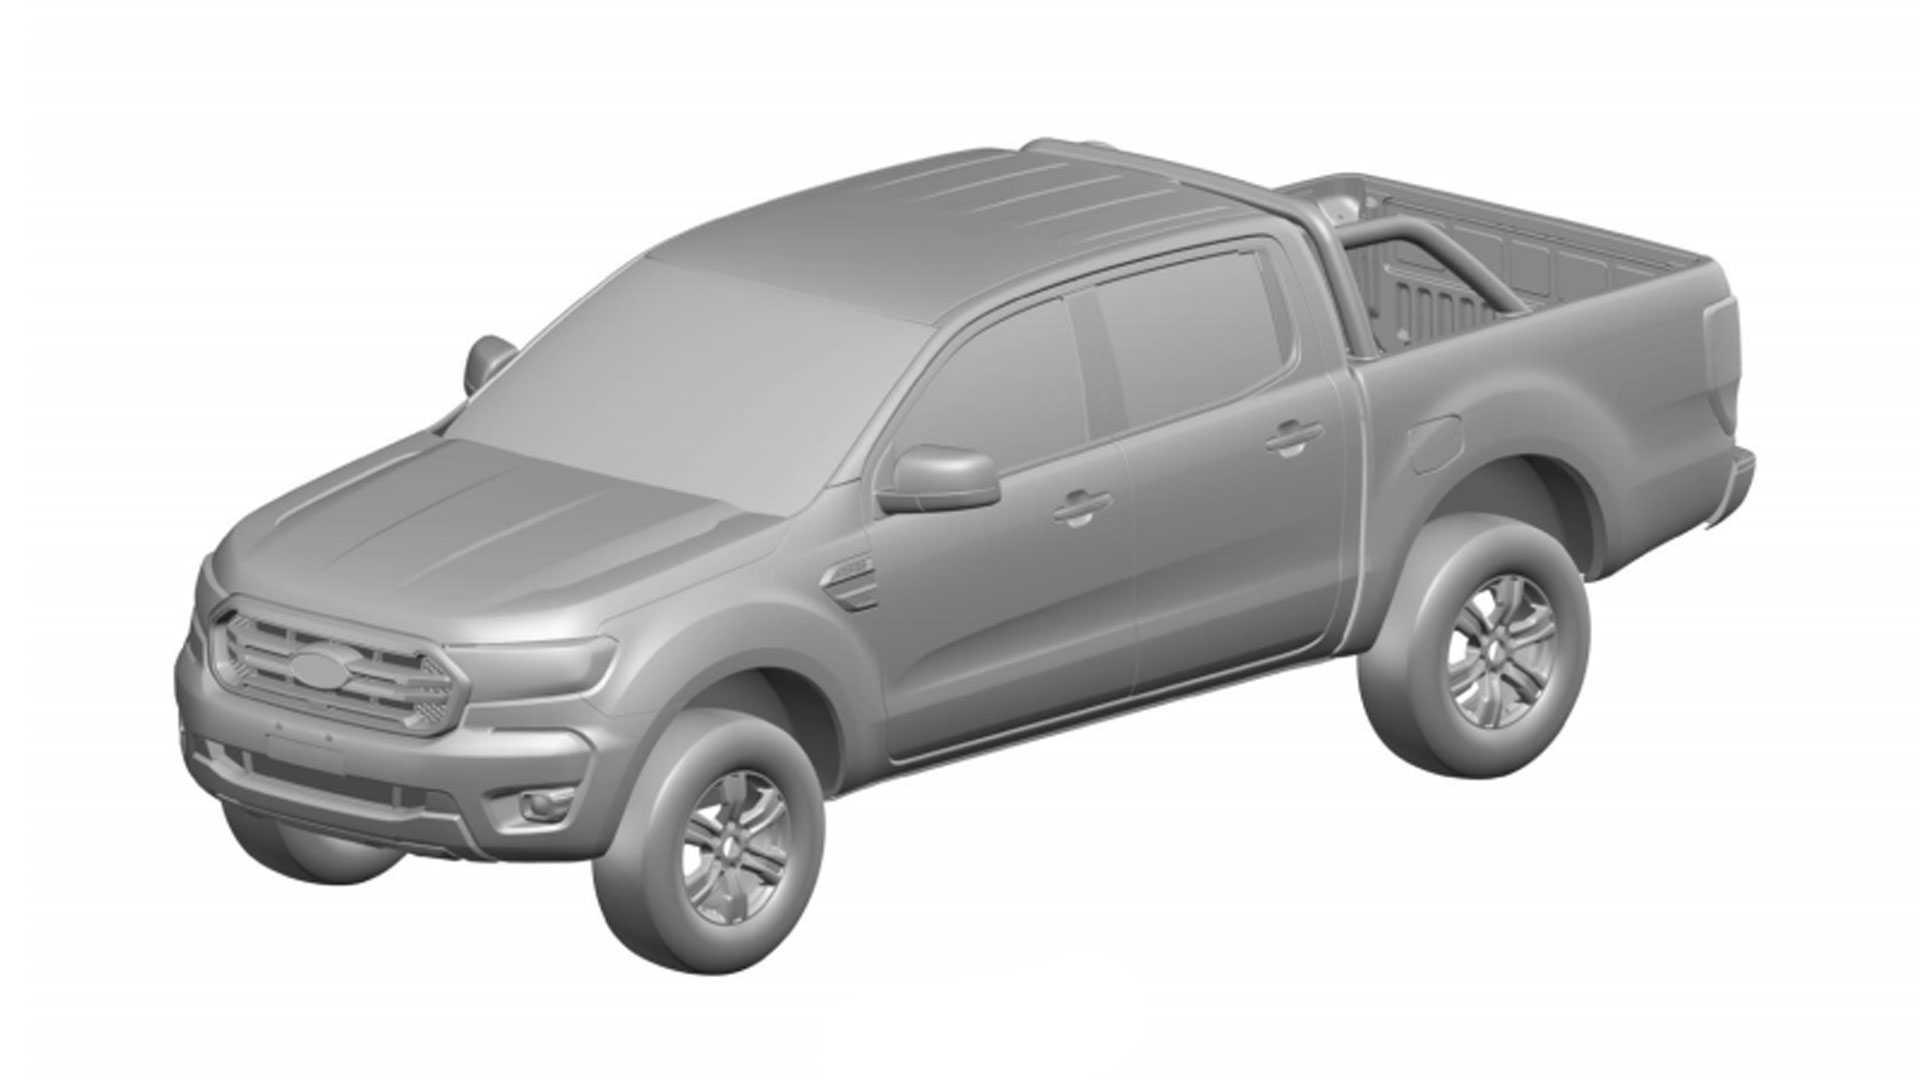 Ford Ranger Reestilizada INPI